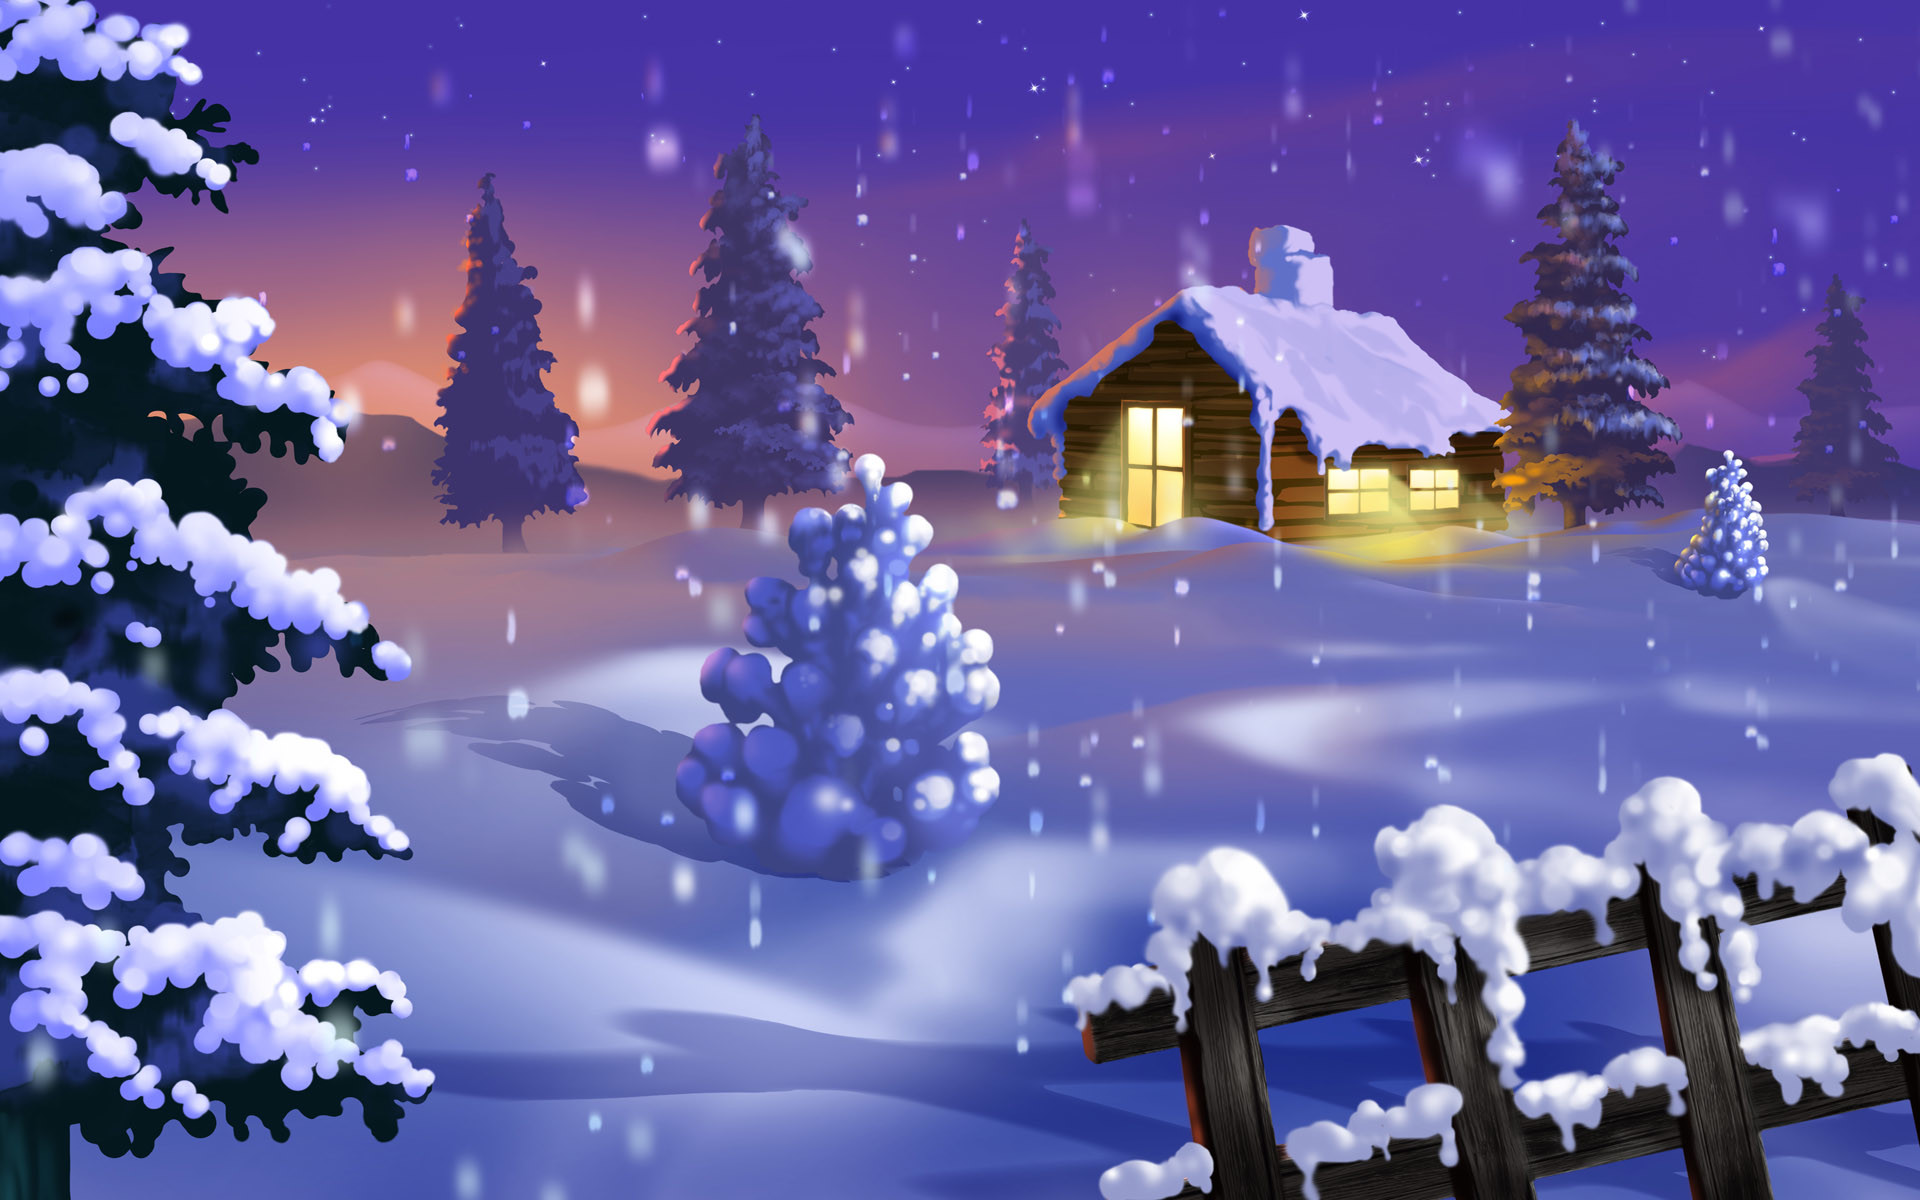 Wallpapers | Free Christmas Winter Wallpapers Download | Desktop .